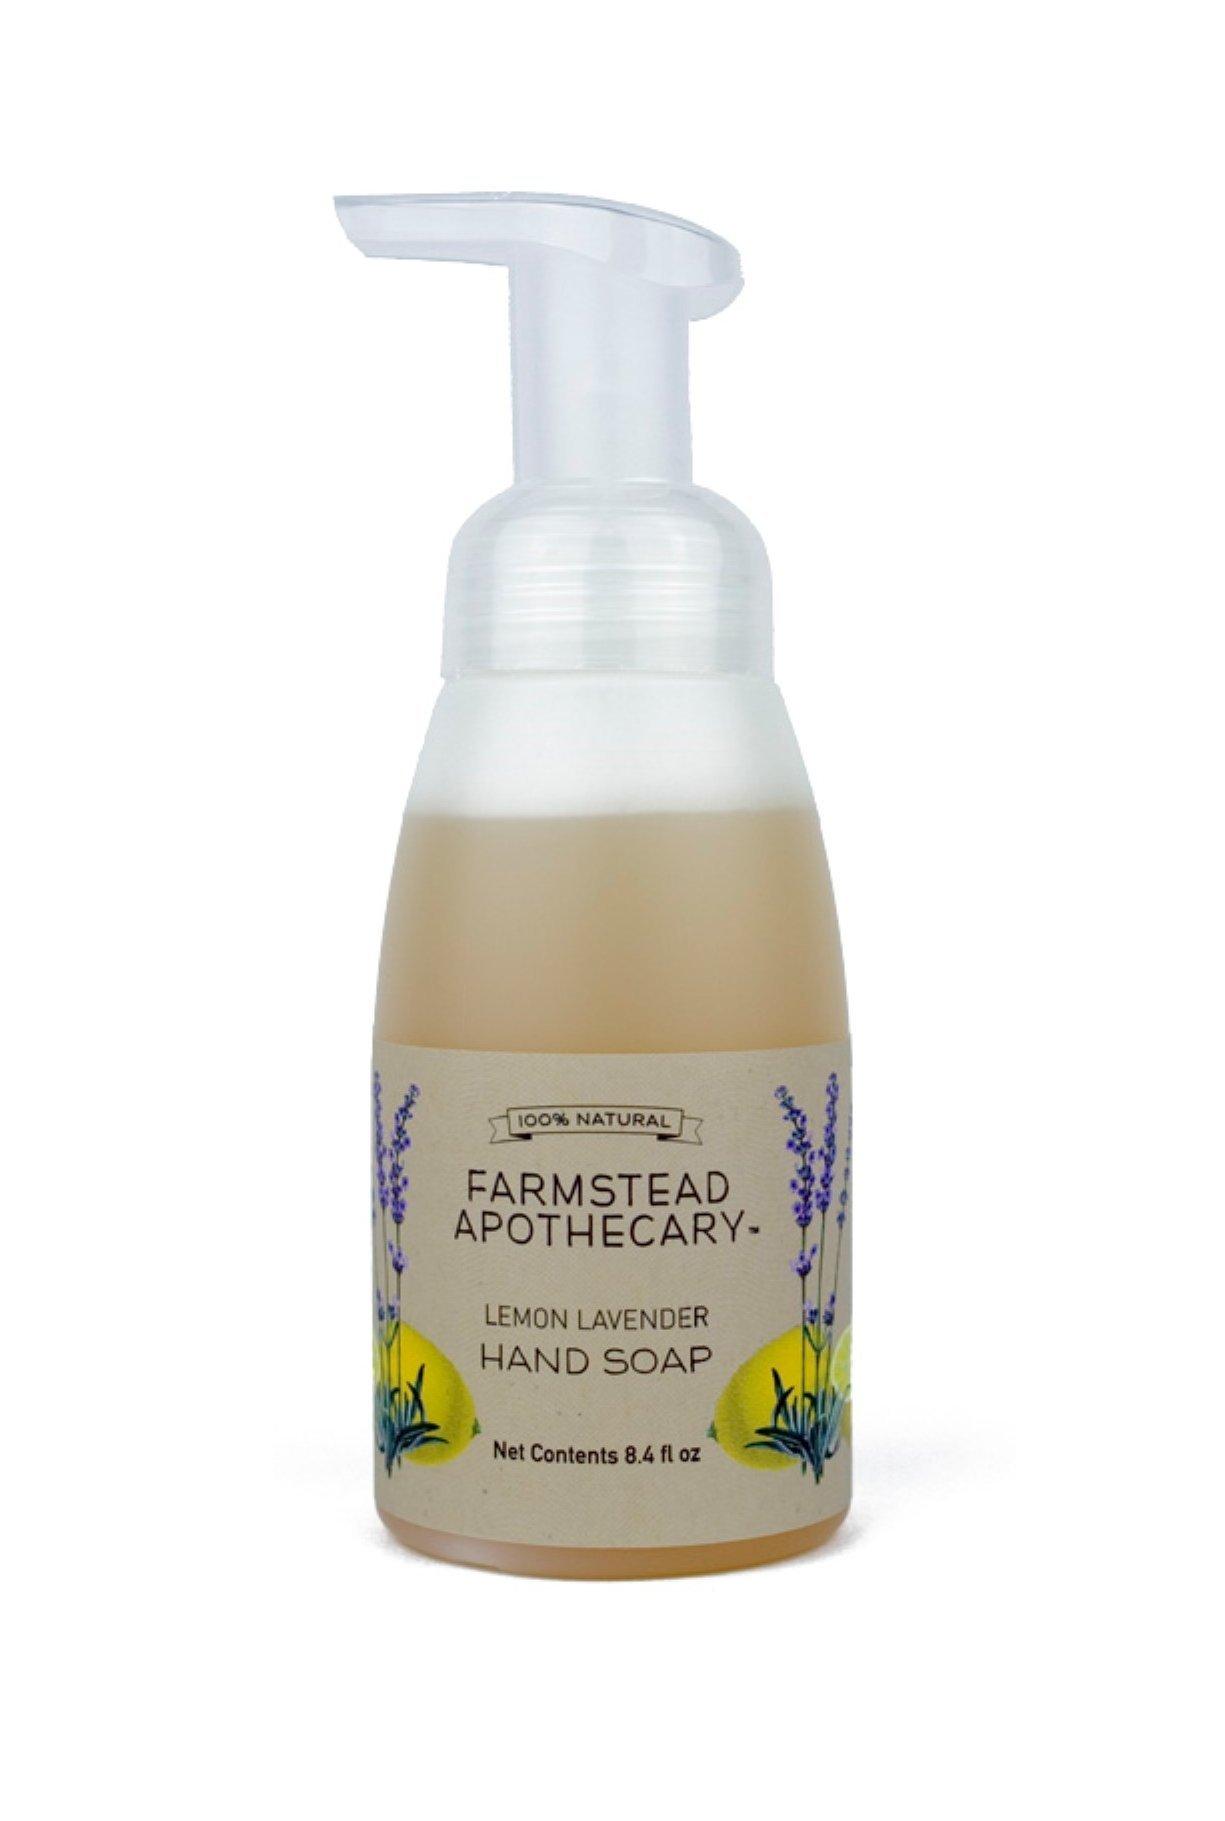 Farmstead Apothecary 100% Natural Foaming Hand Soap with Organic Coconut Oil & Organic Vitamin E Oil, Lemon Lavender 8.4 oz